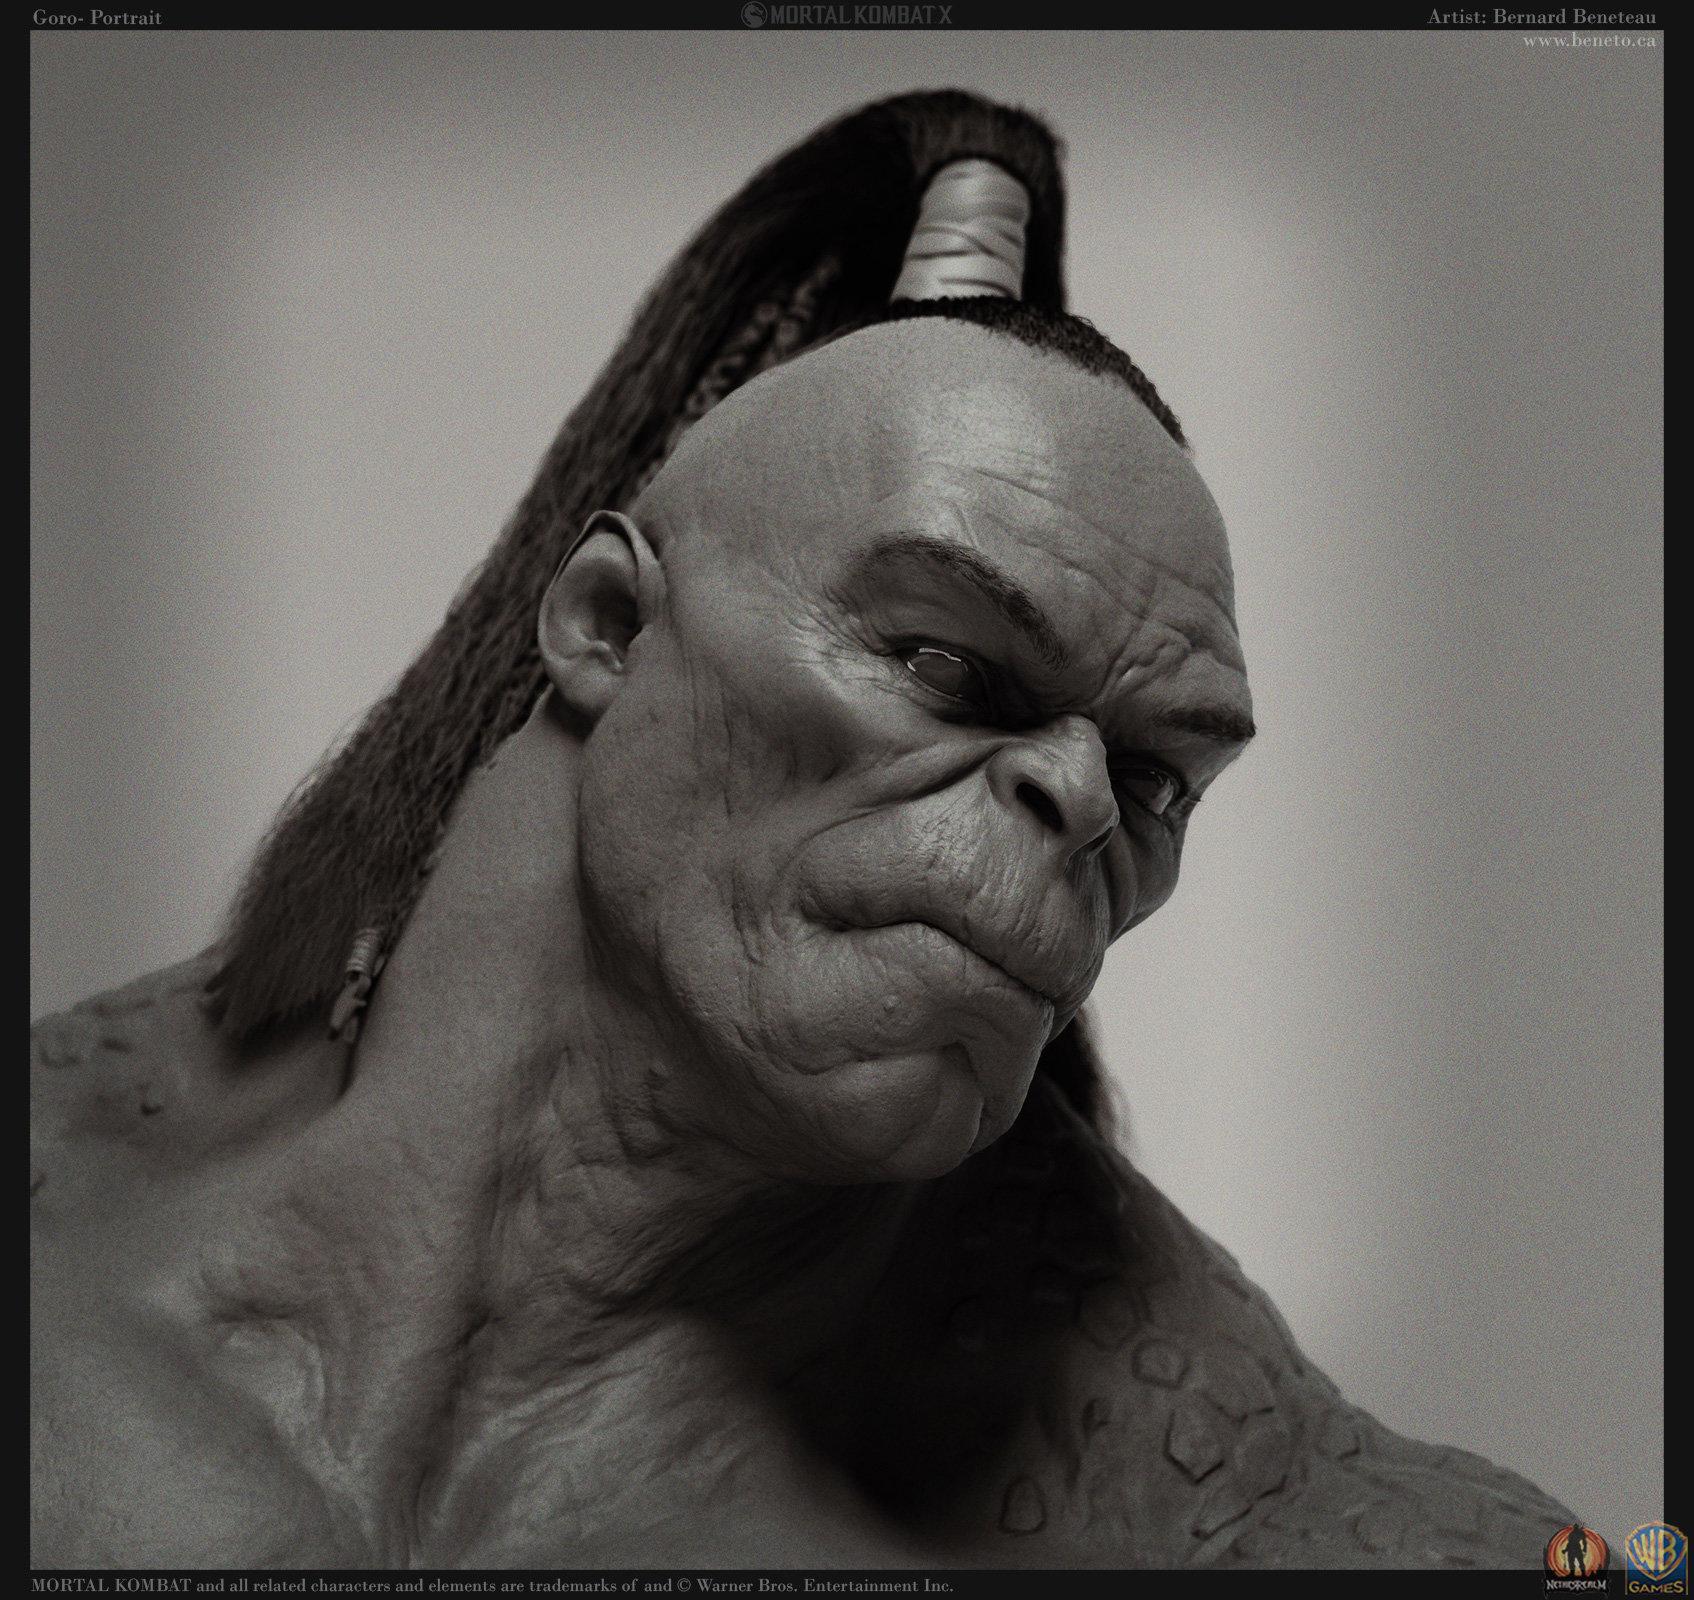 mortal kombat characters goro